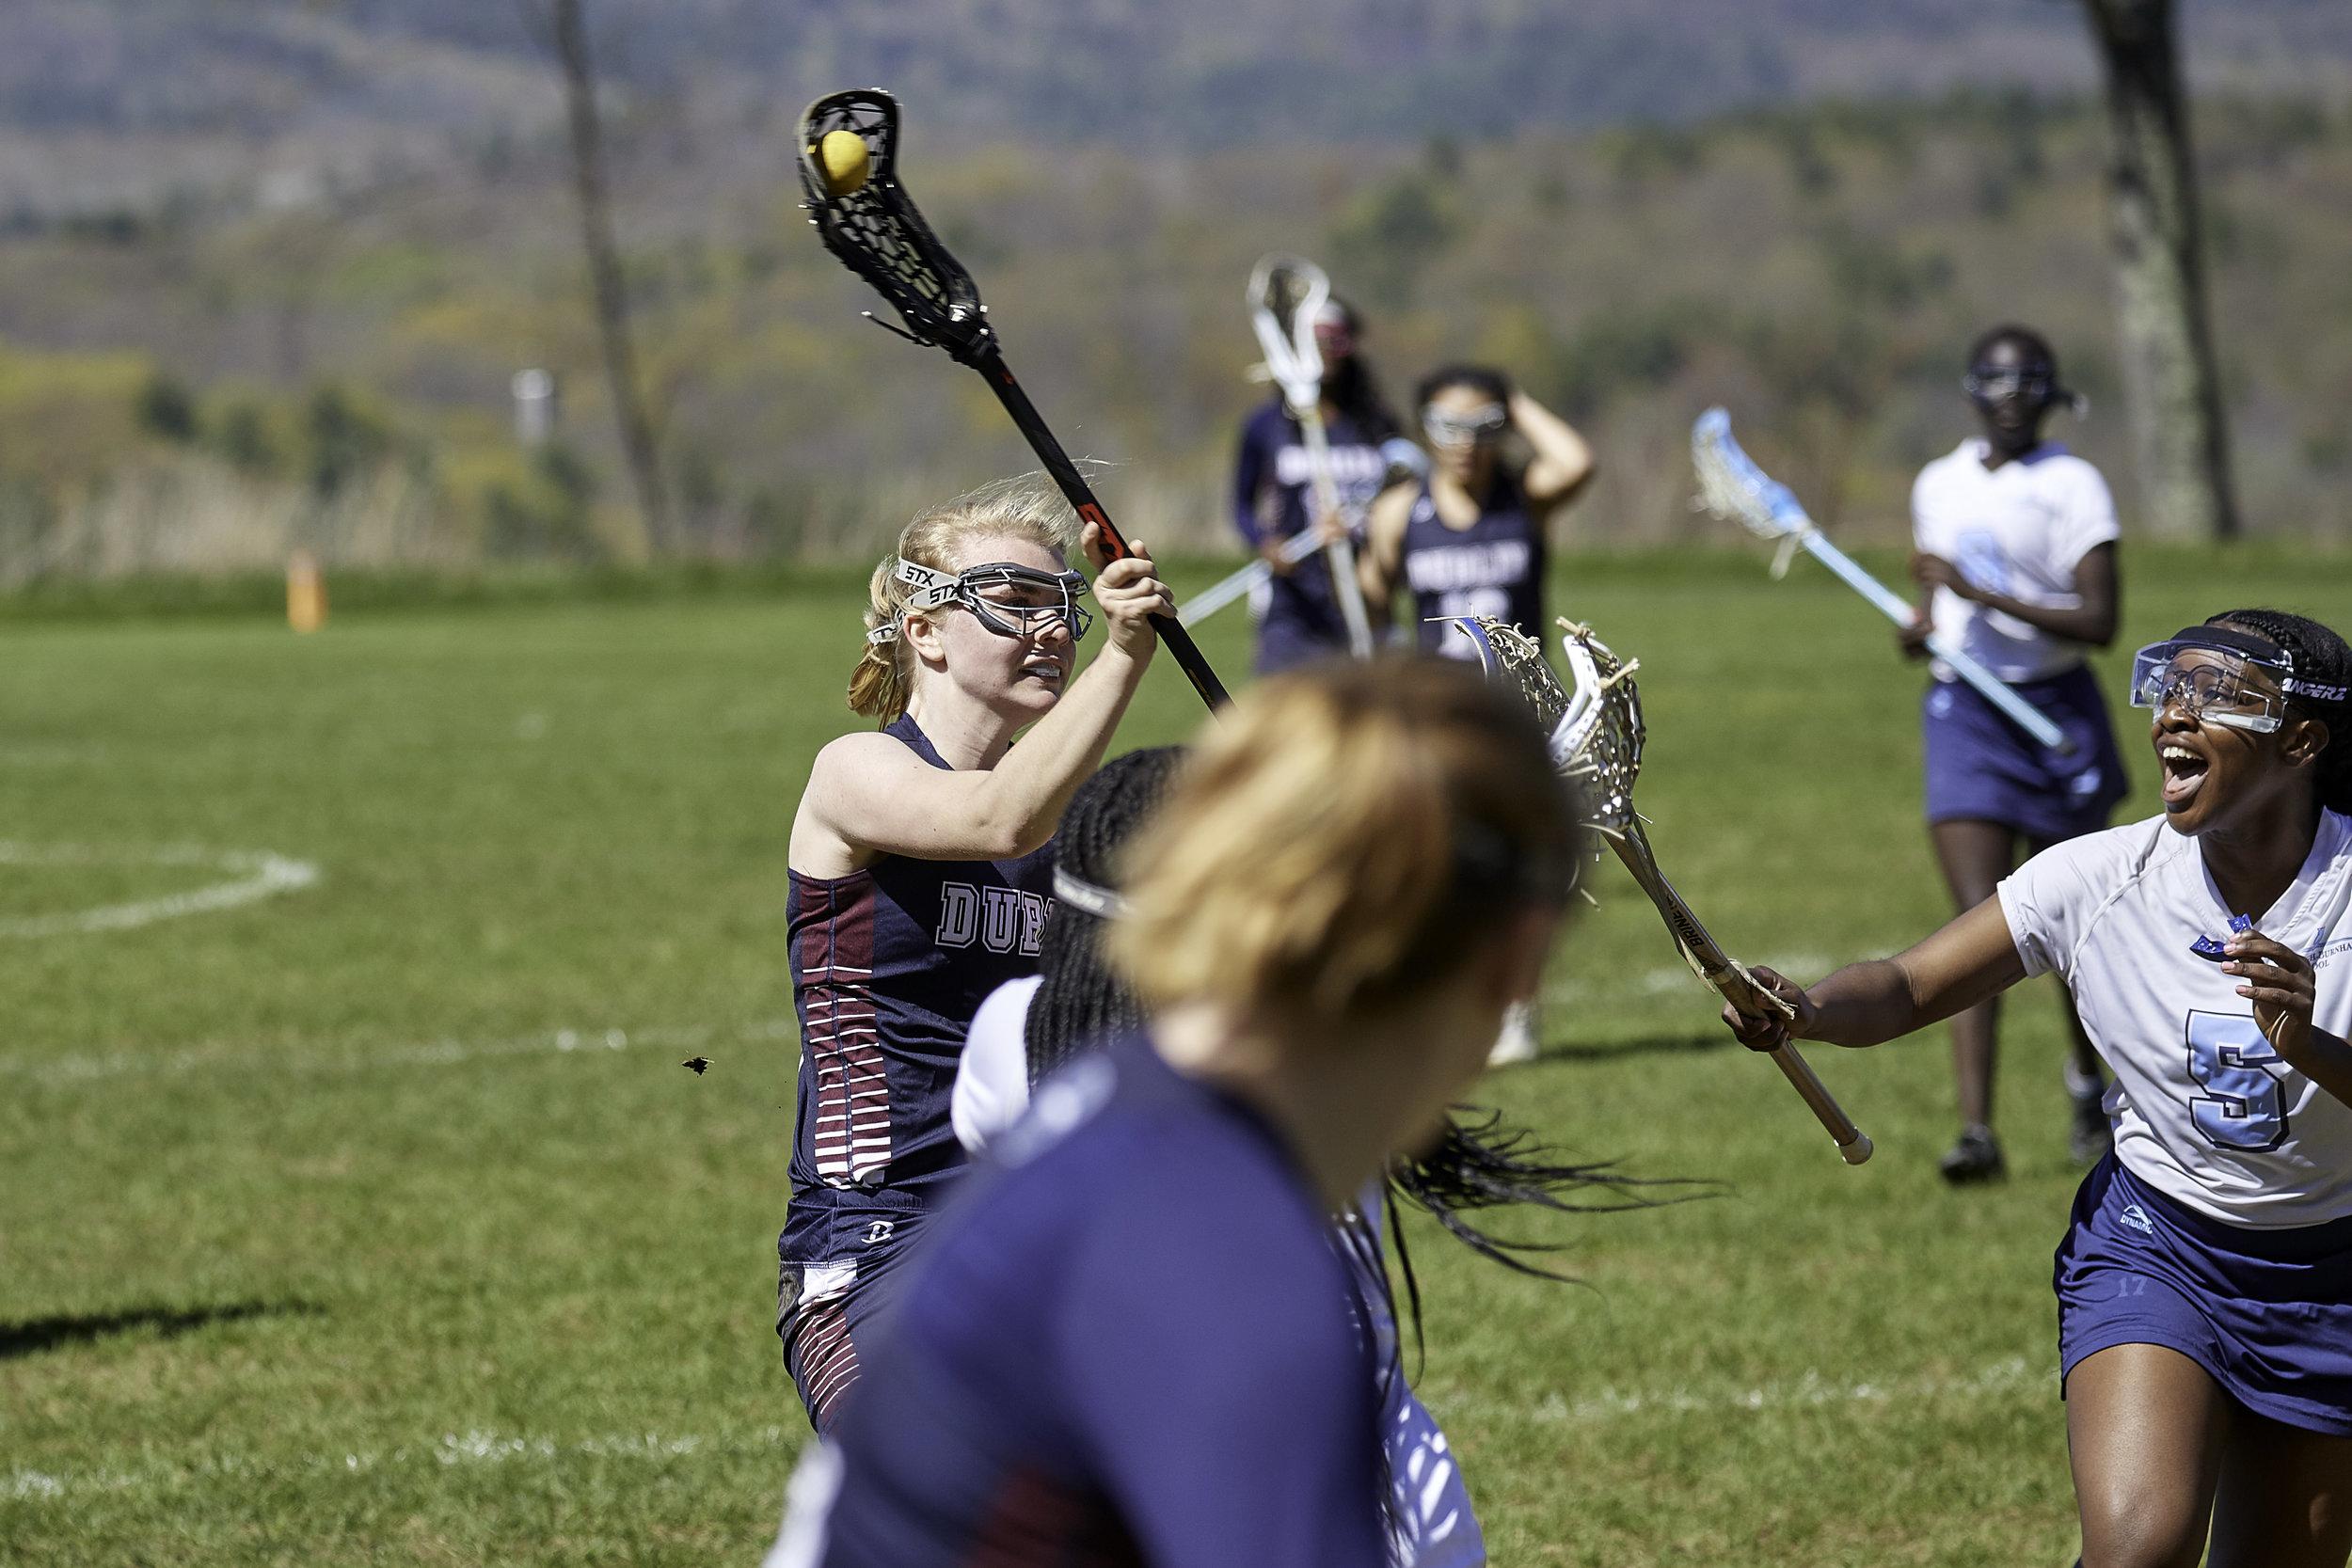 Girls Lacrosse vs. Stoneleigh Burnham School - May 11, 2019 - May 10, 2019193396.jpg